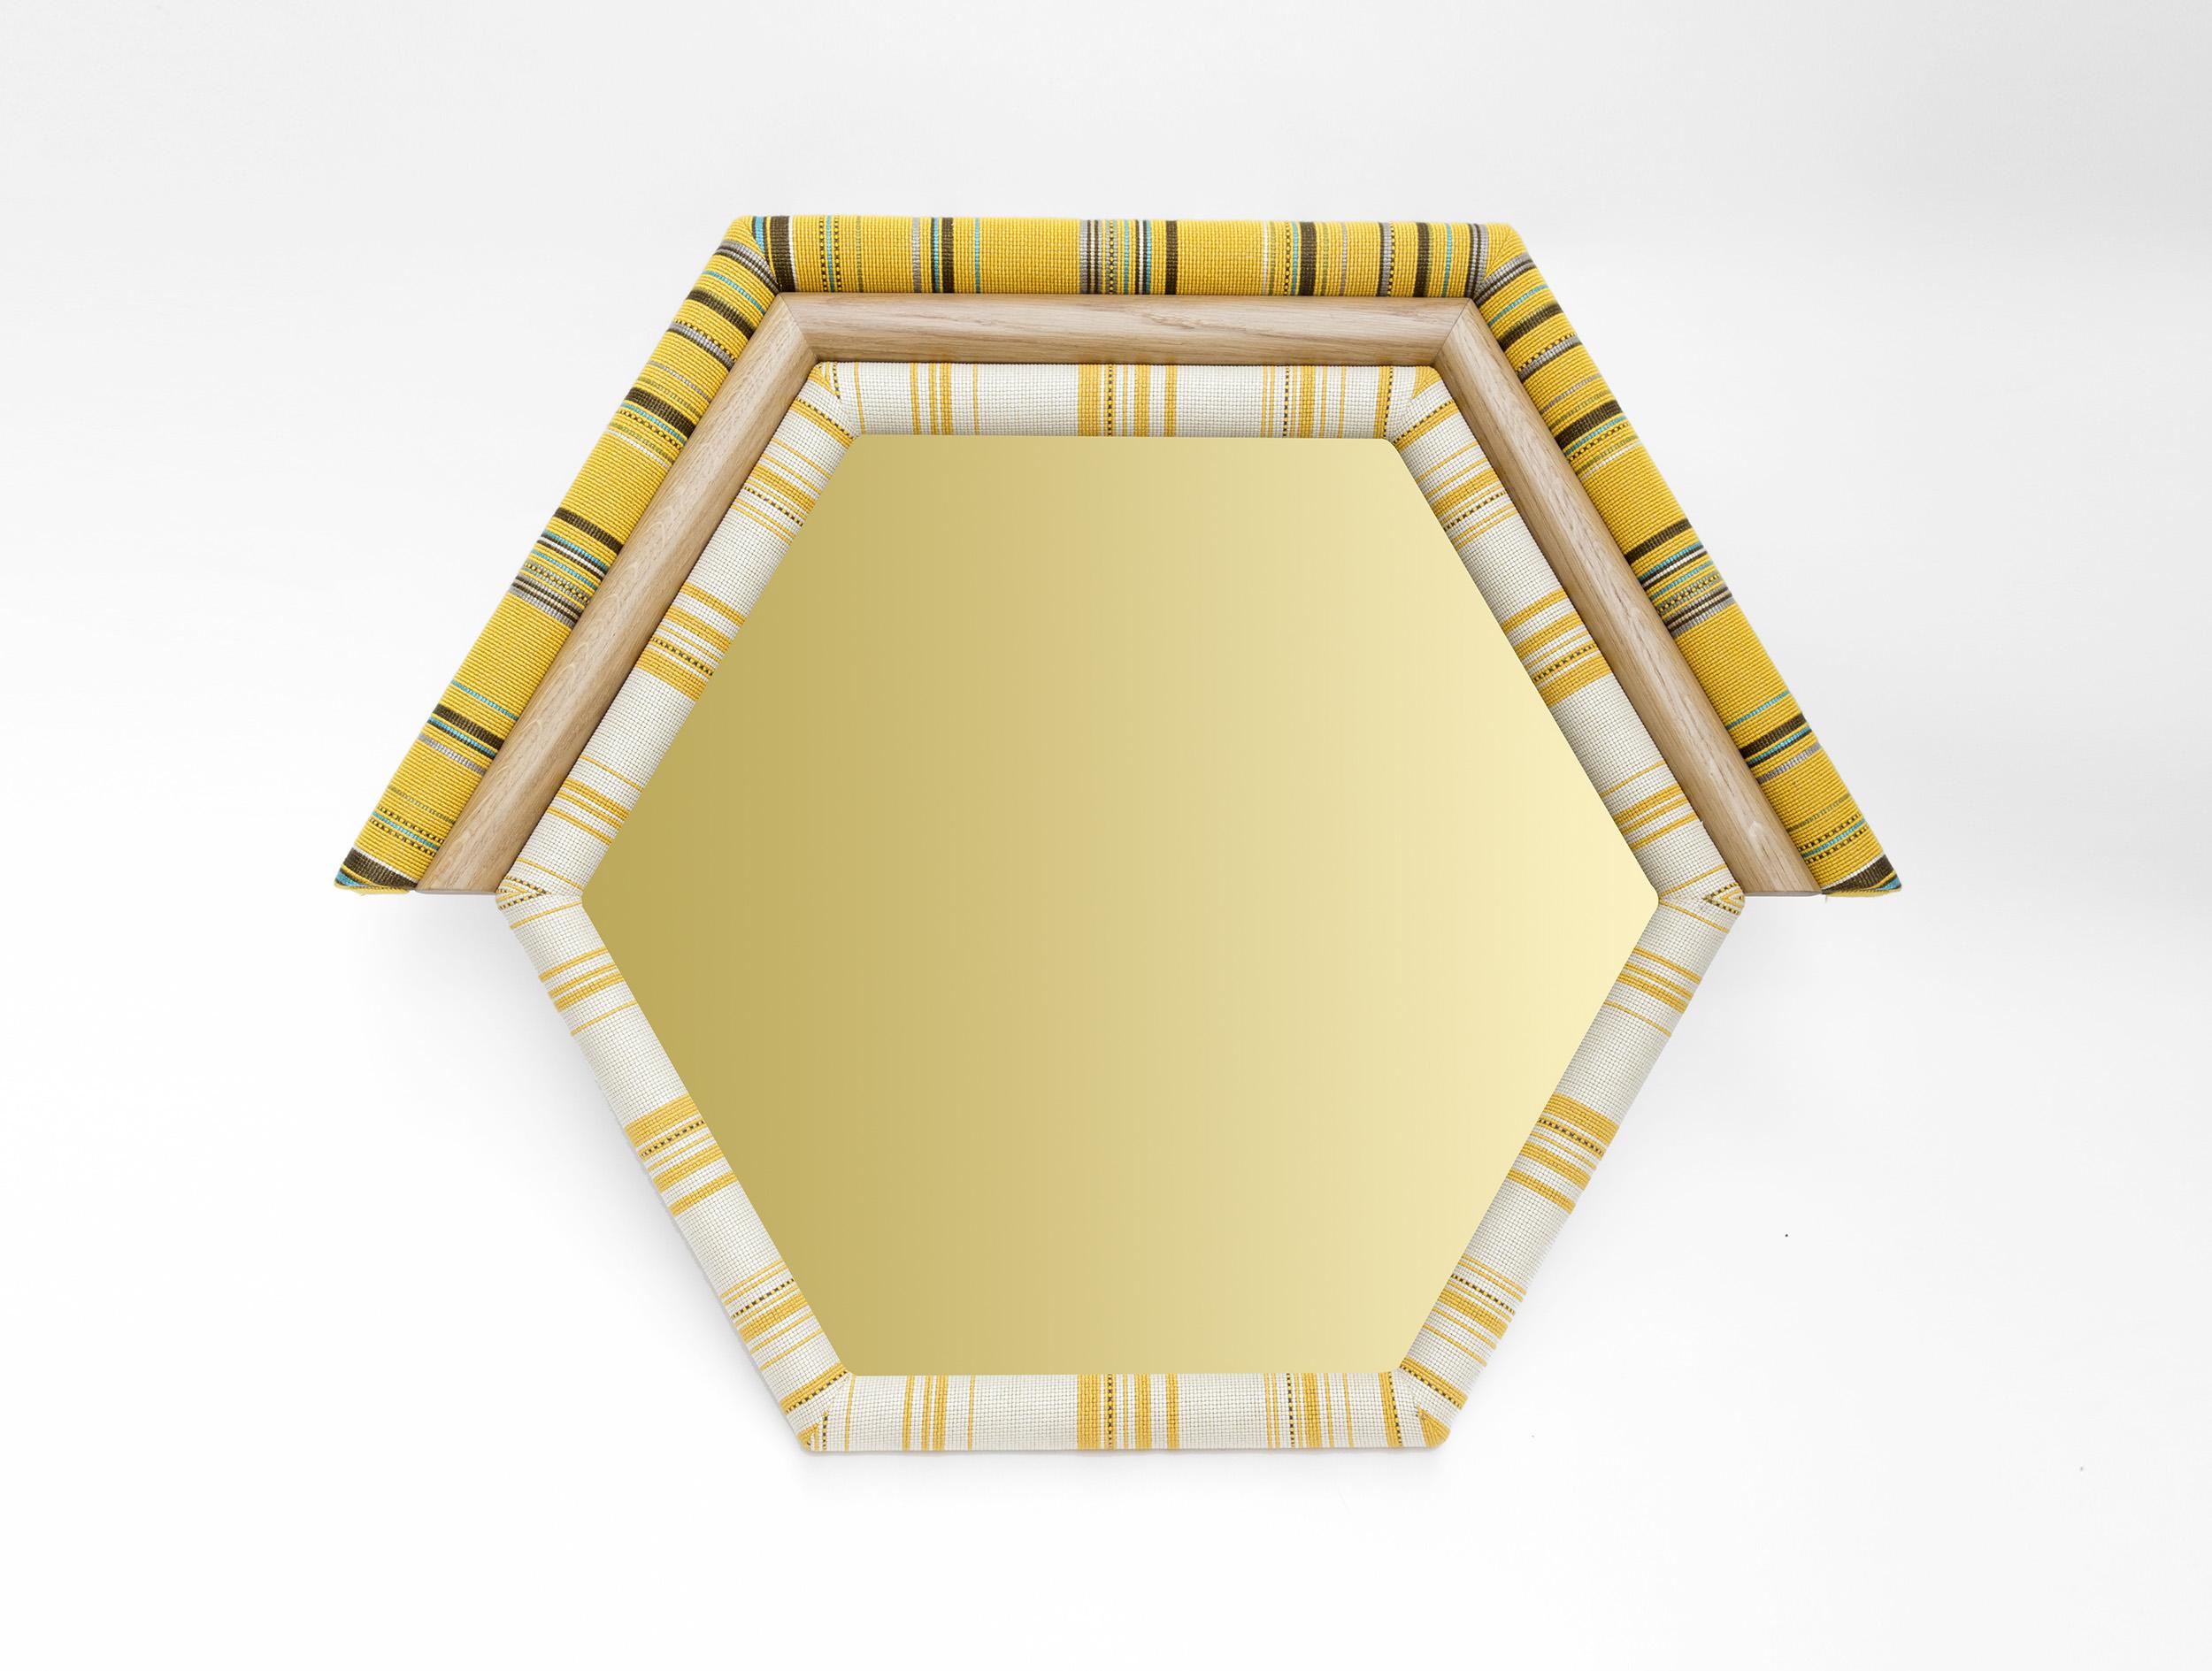 merve kahraman products interiors pontiac hexagon mirror front.jpg